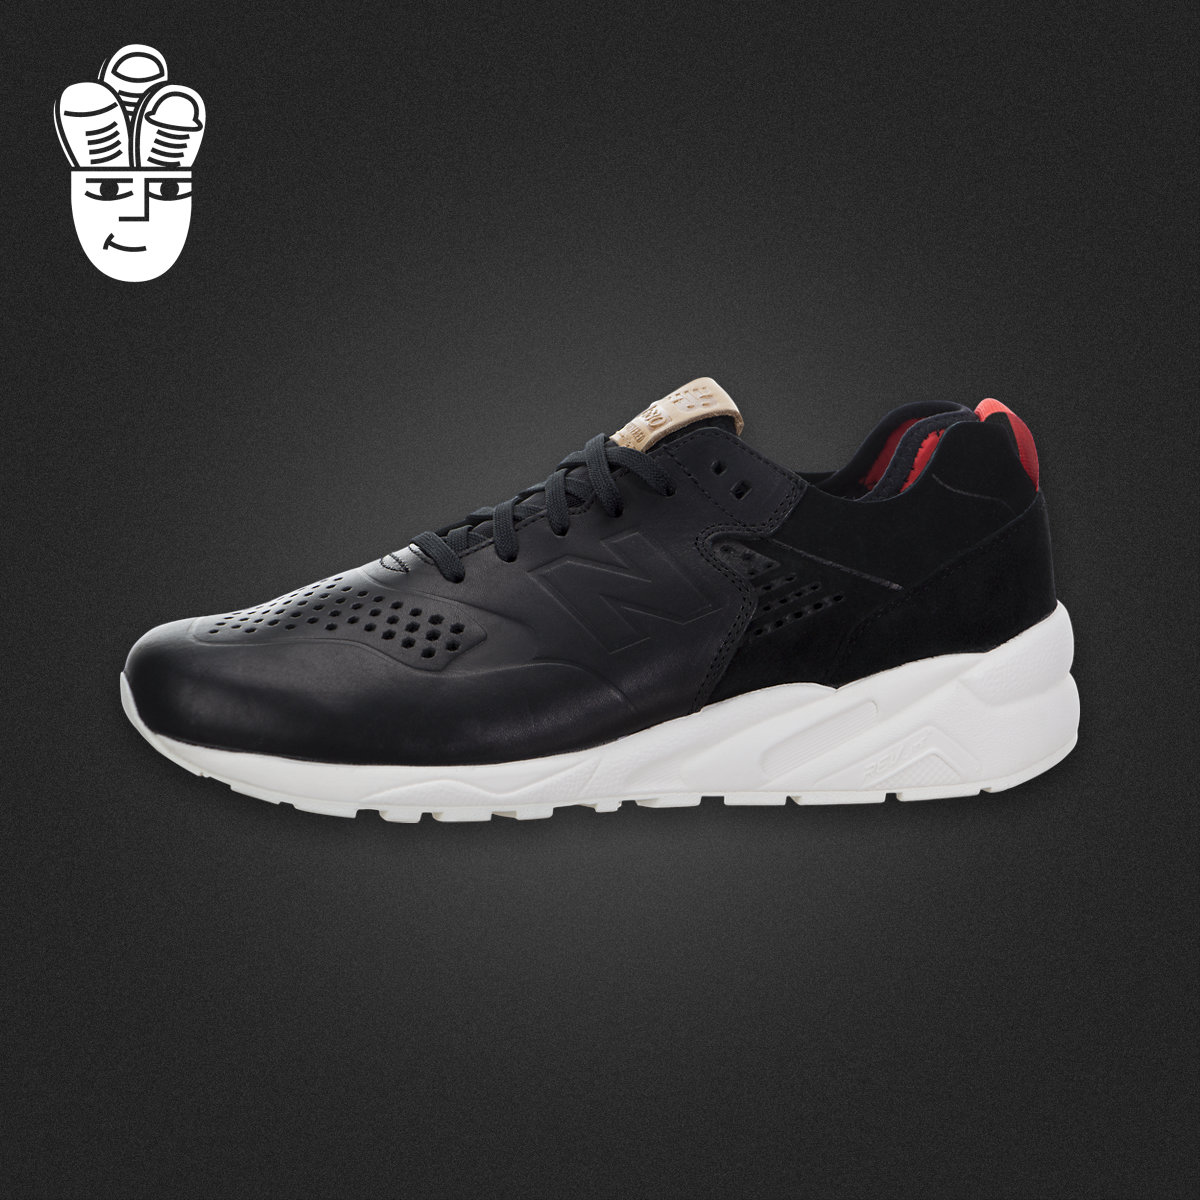 New Balance 580 NB男鞋 时尚复古跑步鞋 慢跑鞋 运动休闲鞋